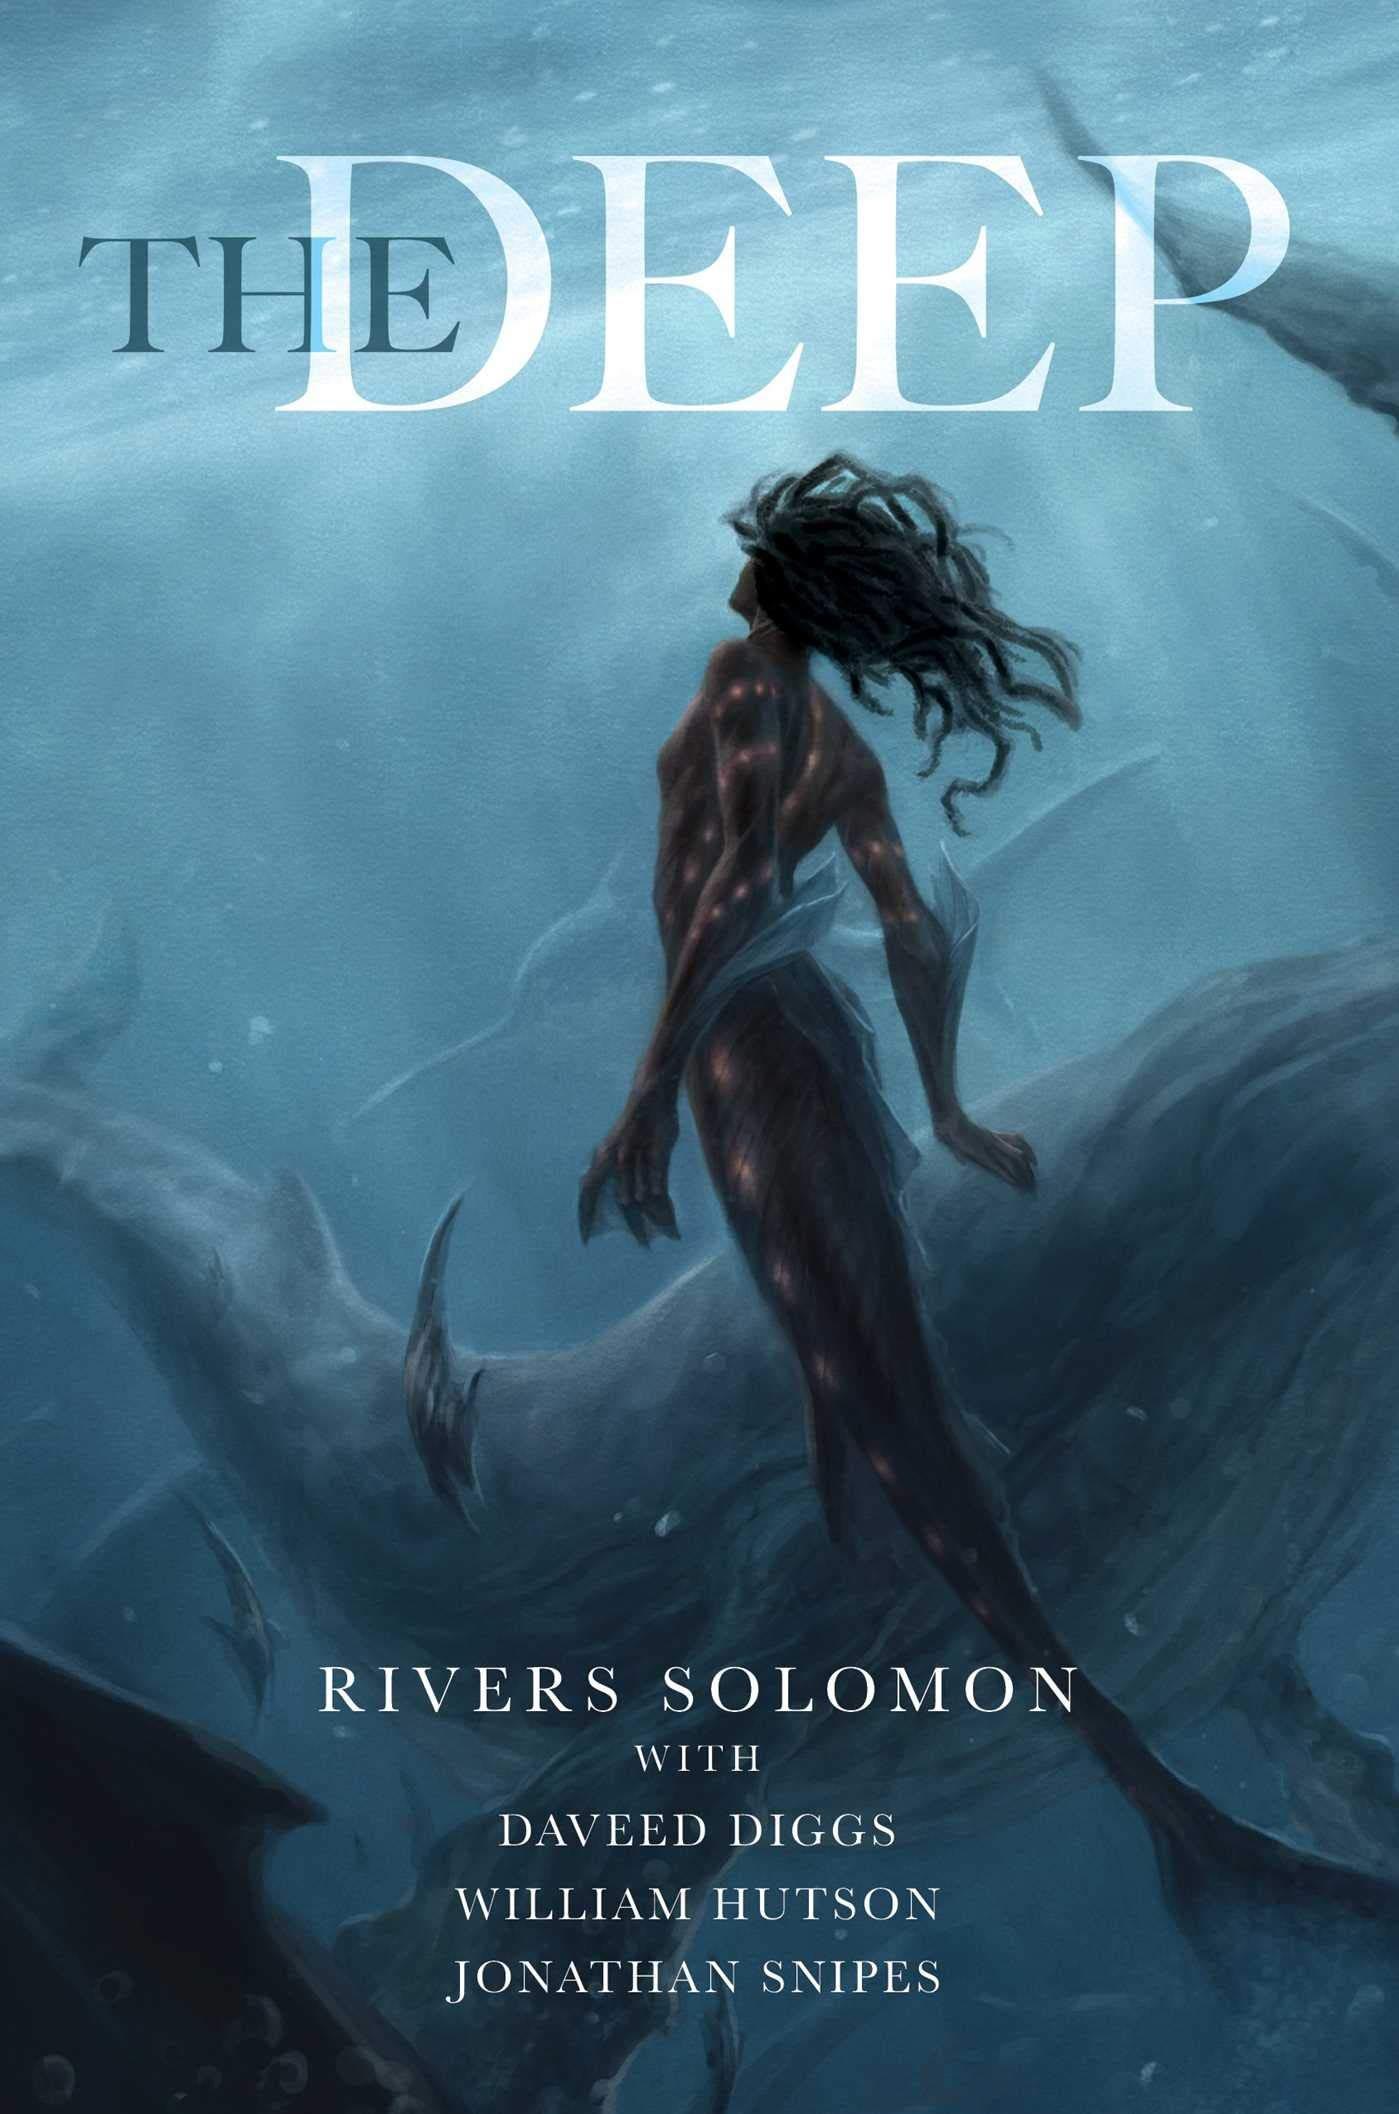 Amazon.com: The Deep (9781534439863): Solomon, Rivers, Diggs ...